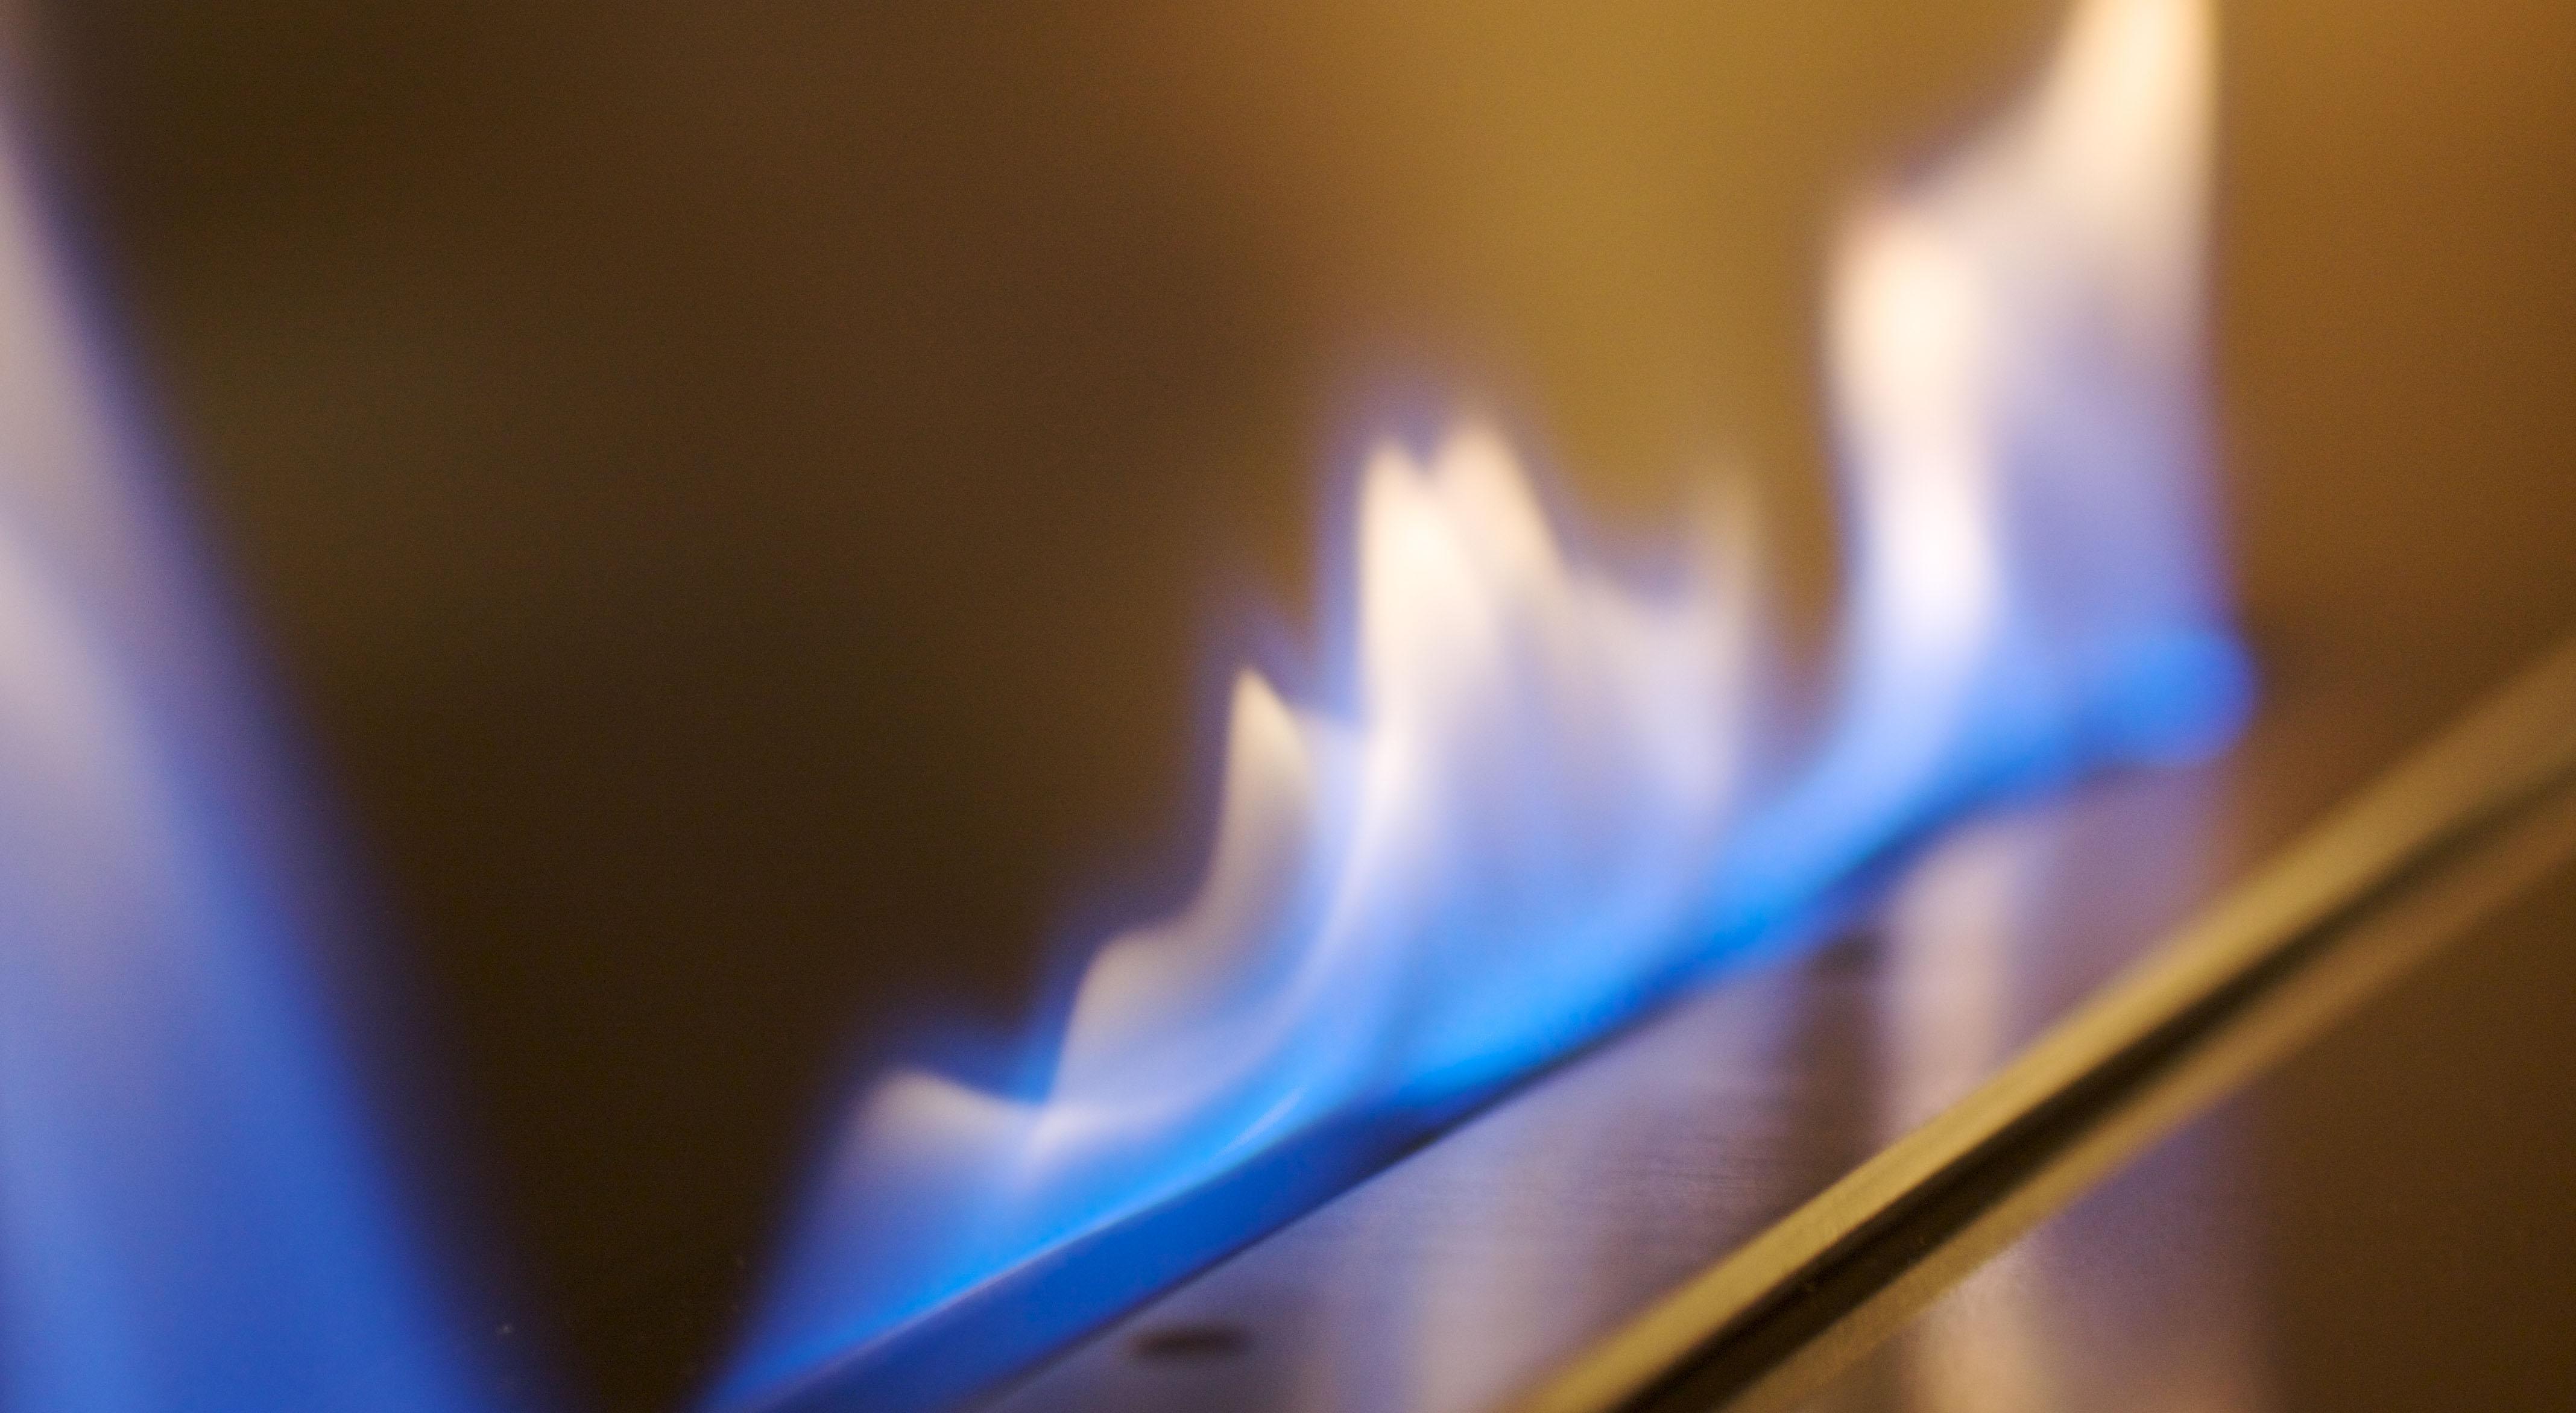 brandbare vloeistoffen.jpg